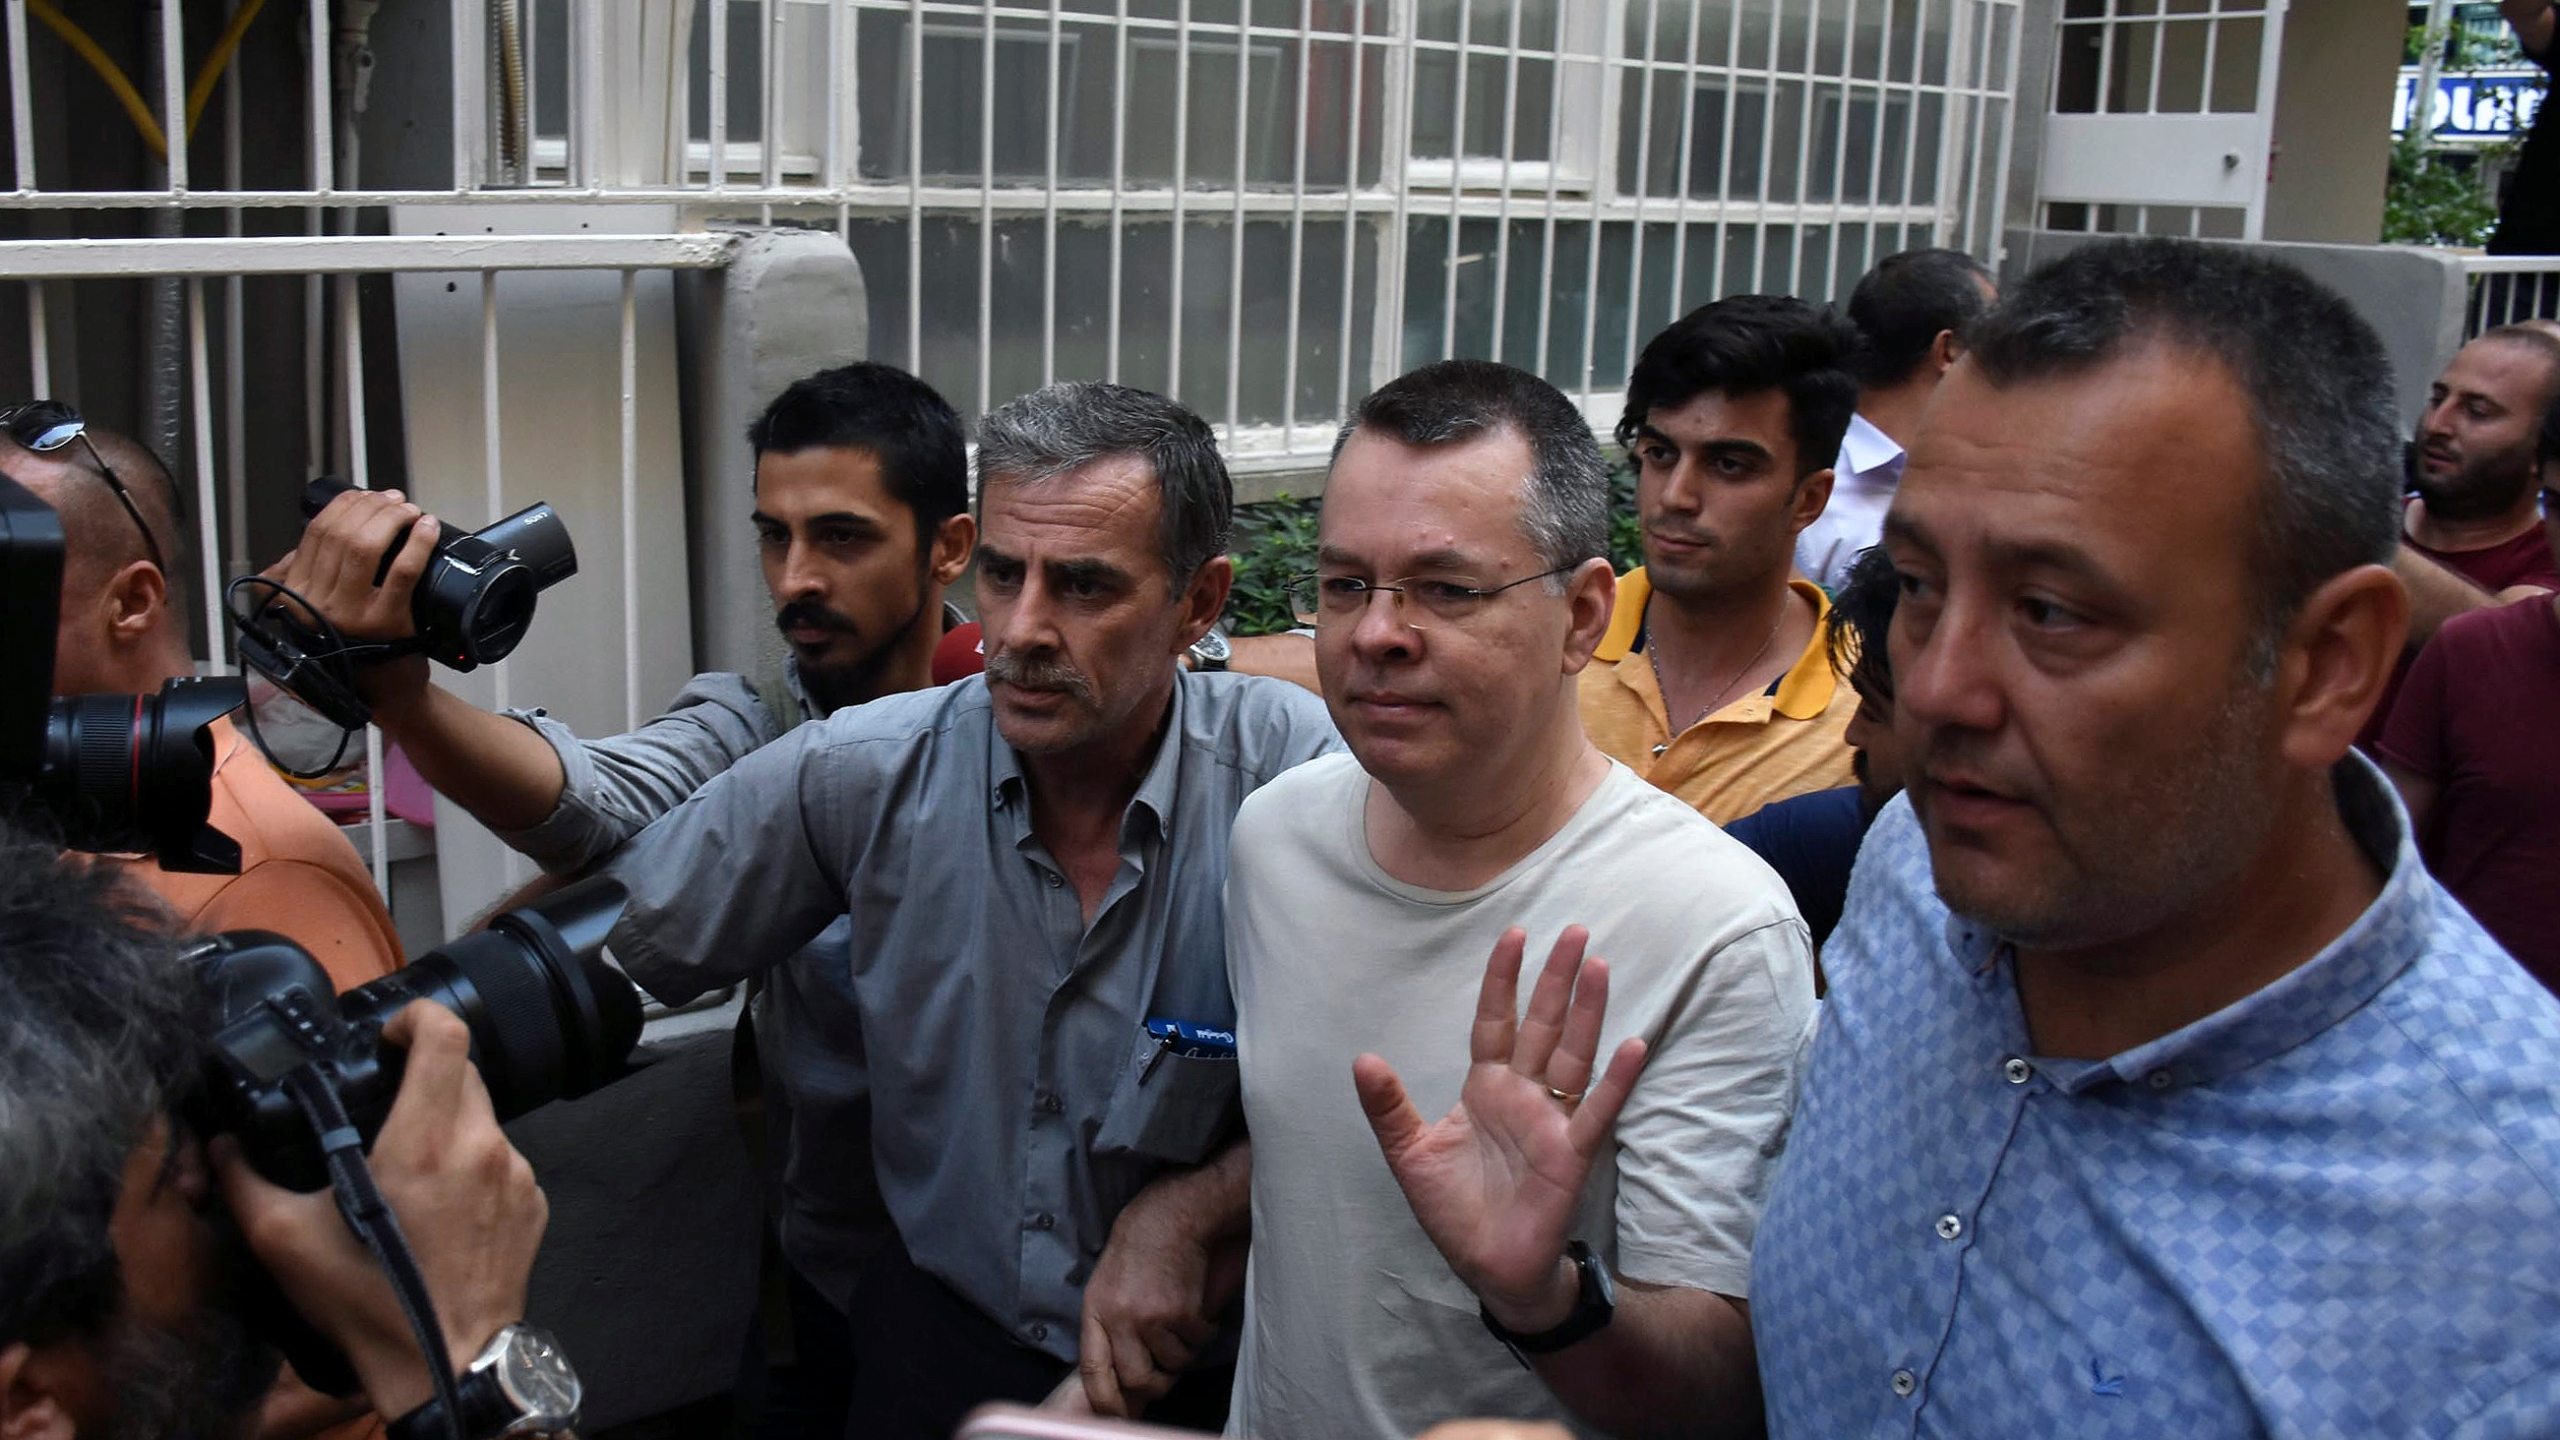 Turkey_US_Pastor_Trial_14437-159532.jpg11143908